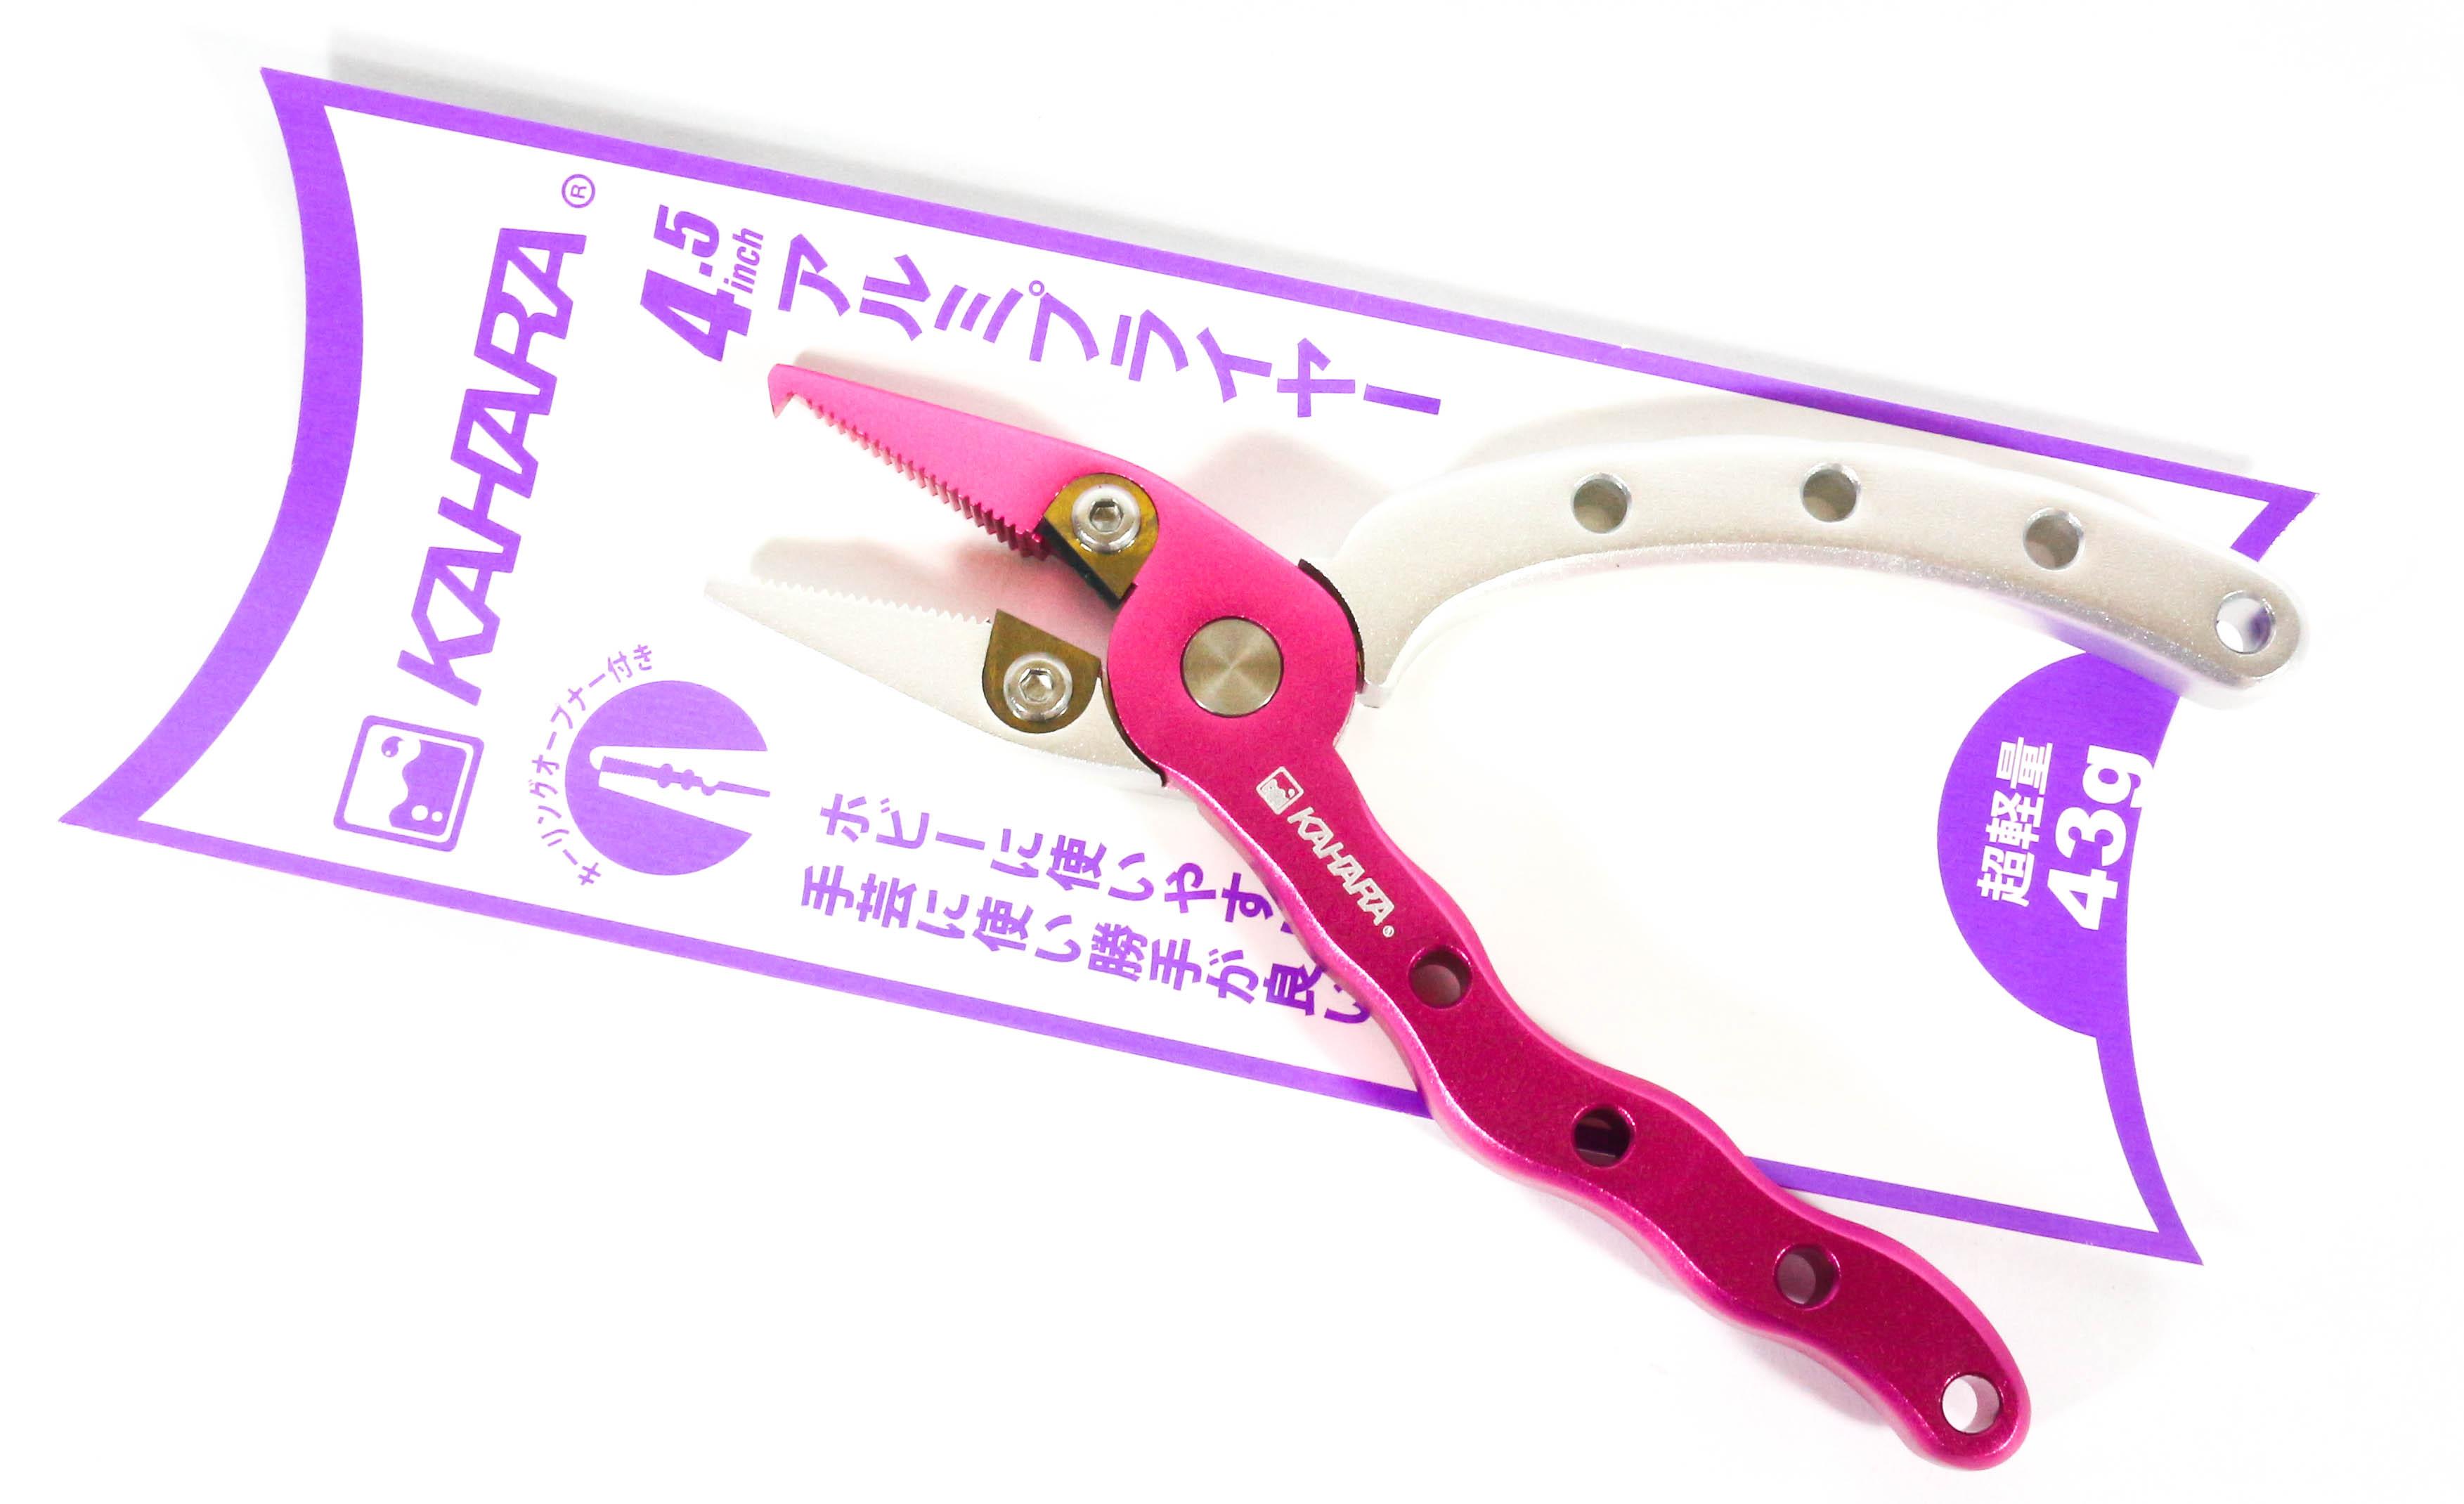 Kahara Aluminum Split Ring Pliers Light Game 43 Grams 4.5 Inch Strawberry (7460)